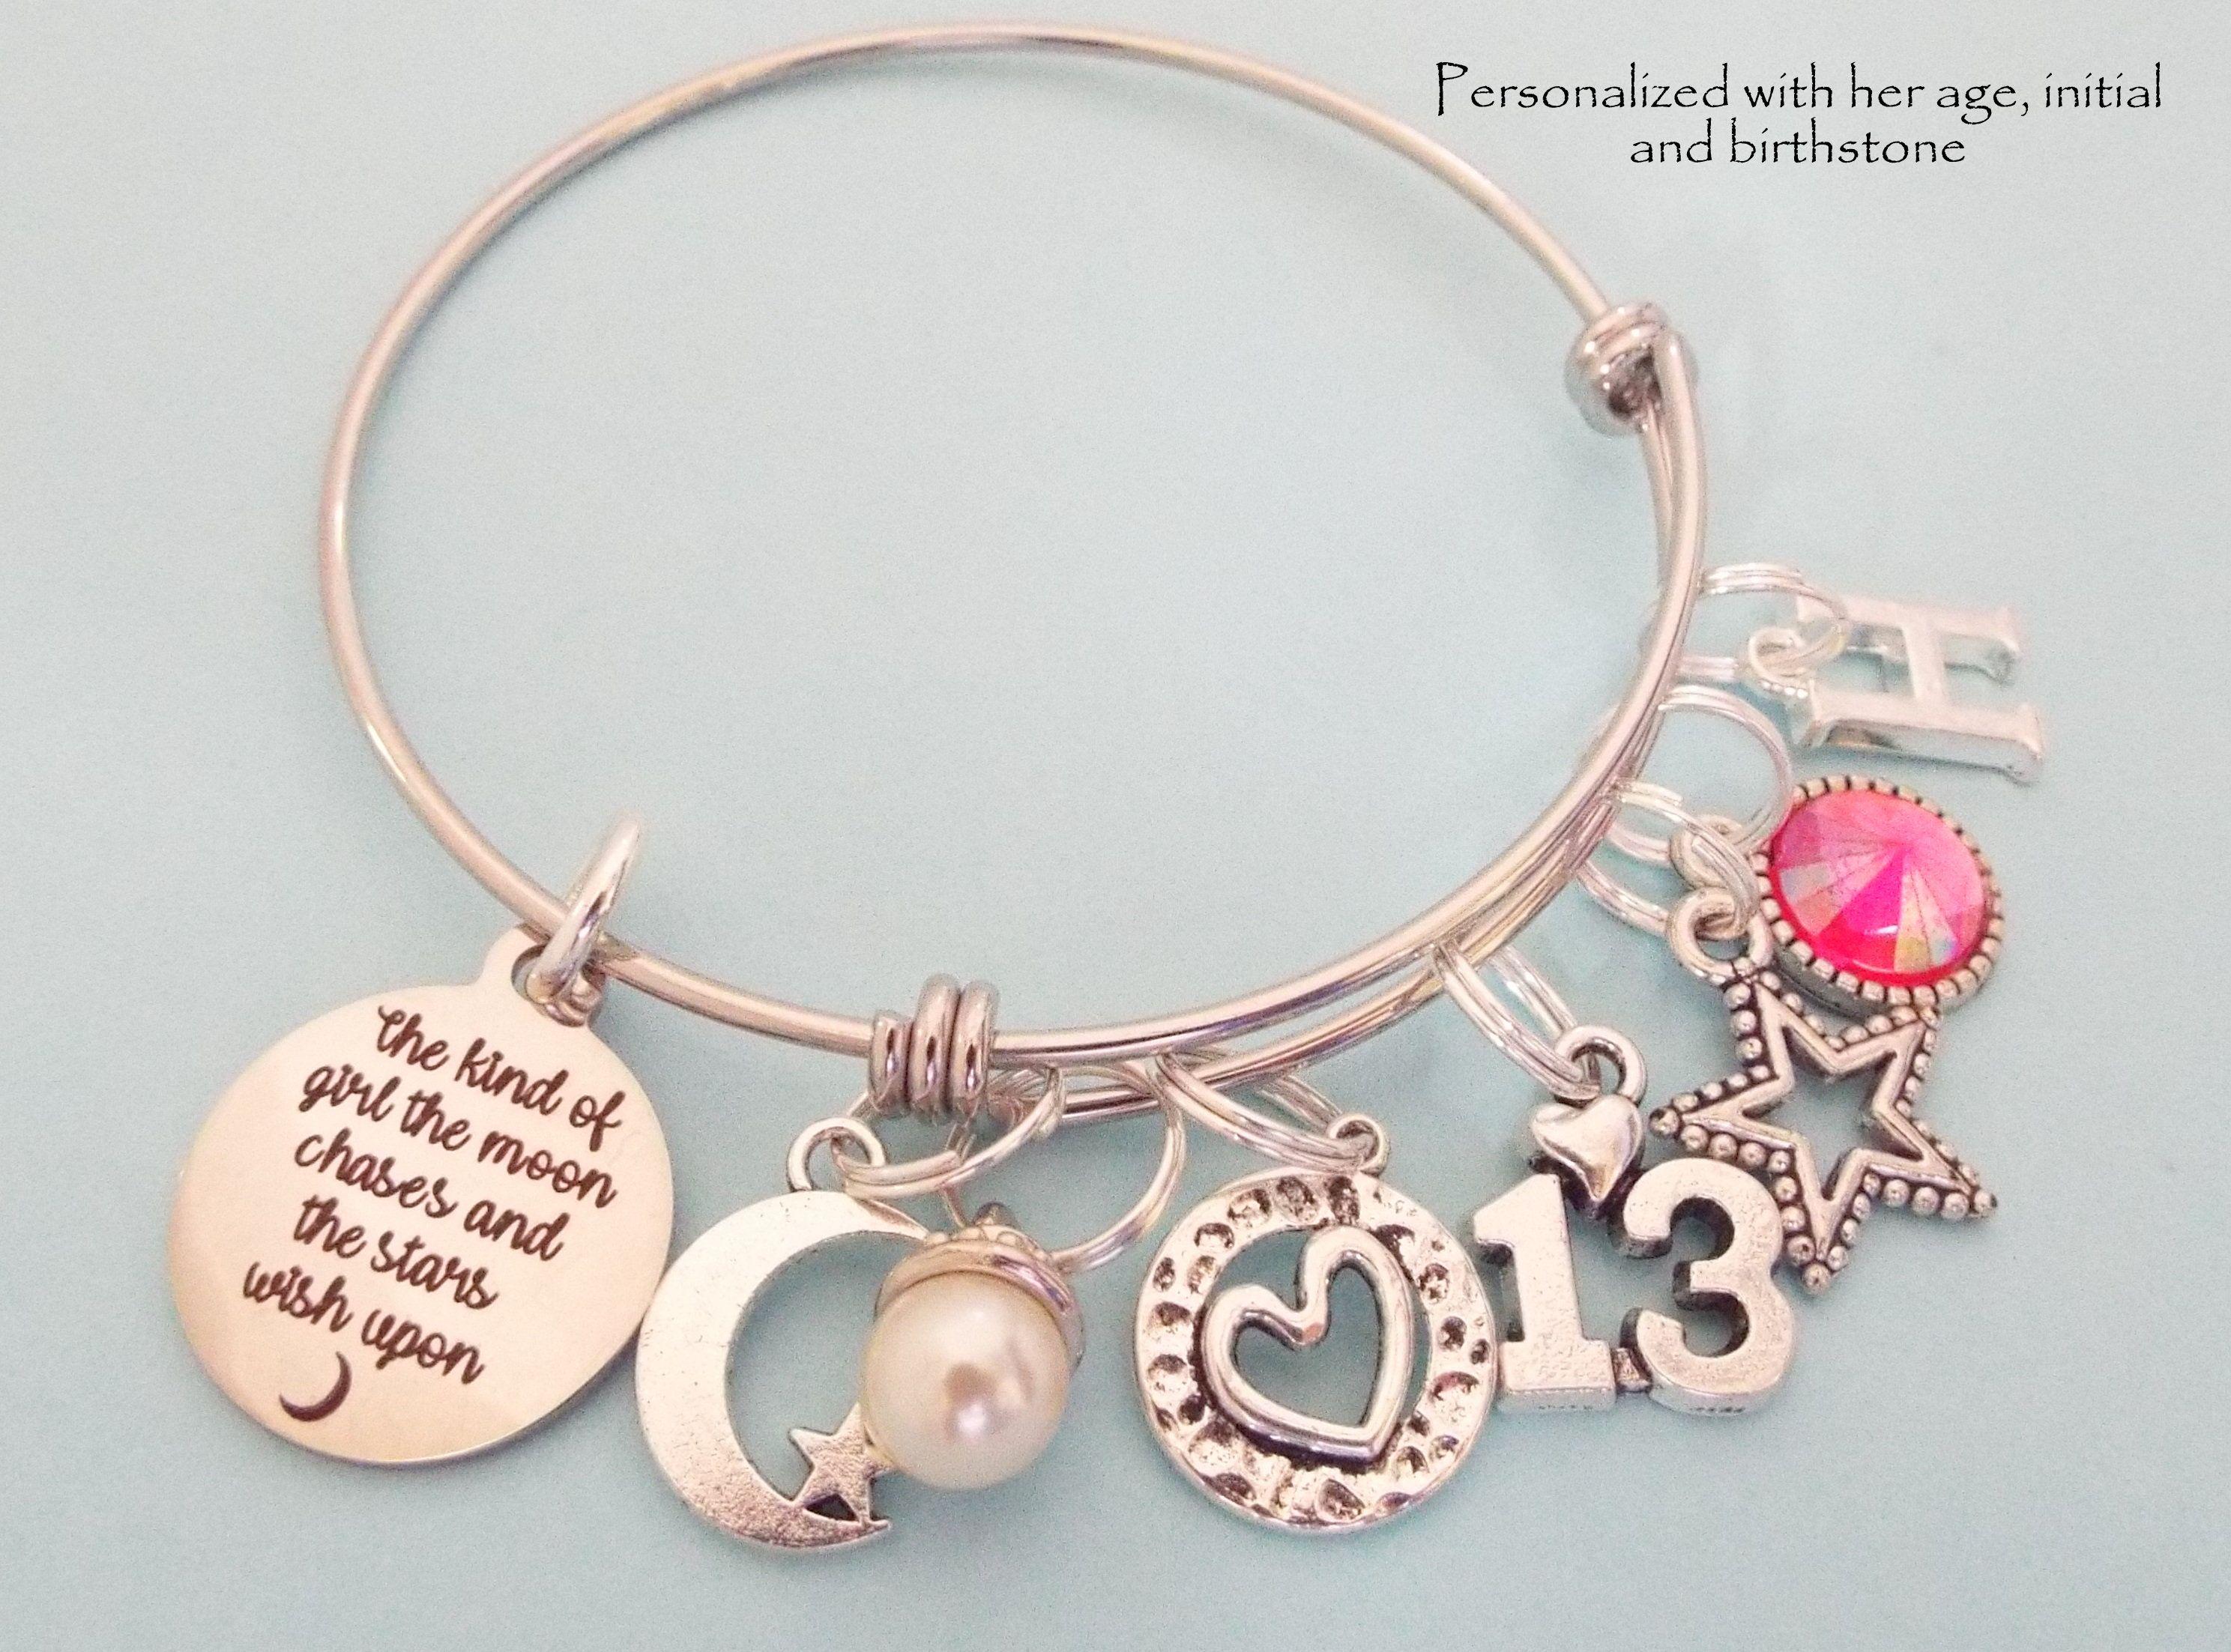 13 Year Old Girl Birthday Gift Daughter 13th Birthday Etsy In 2020 Birthday Gifts For Girls Teenage Girl Gifts Birthday Charm Bracelet